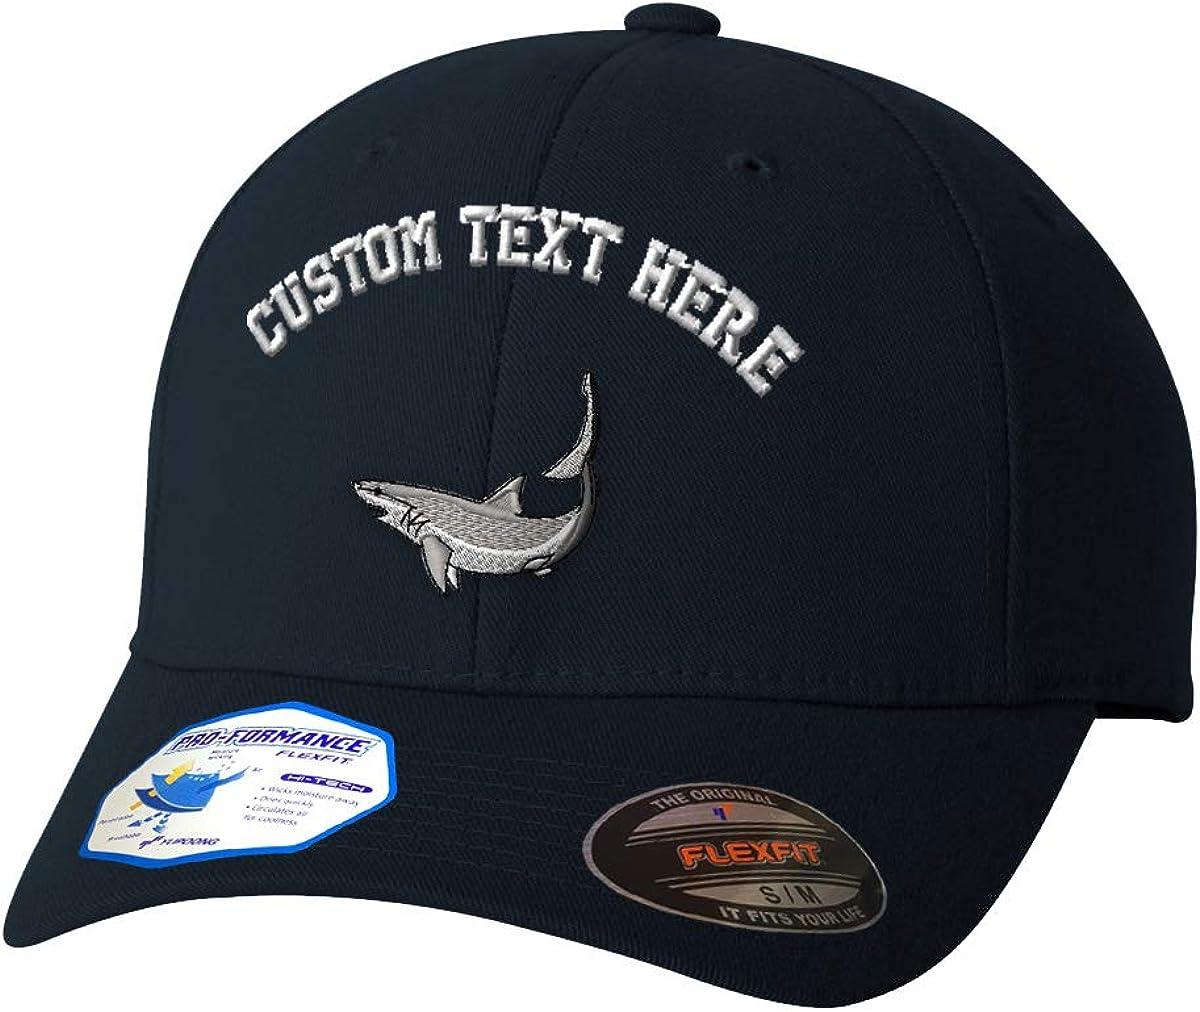 Custom Text Embroidered Mako Shark Style 1 Unisex Adult Elastic Polyester/Spandex Flexfit Pro-Formance Hat Baseball Cap - Dark Navy